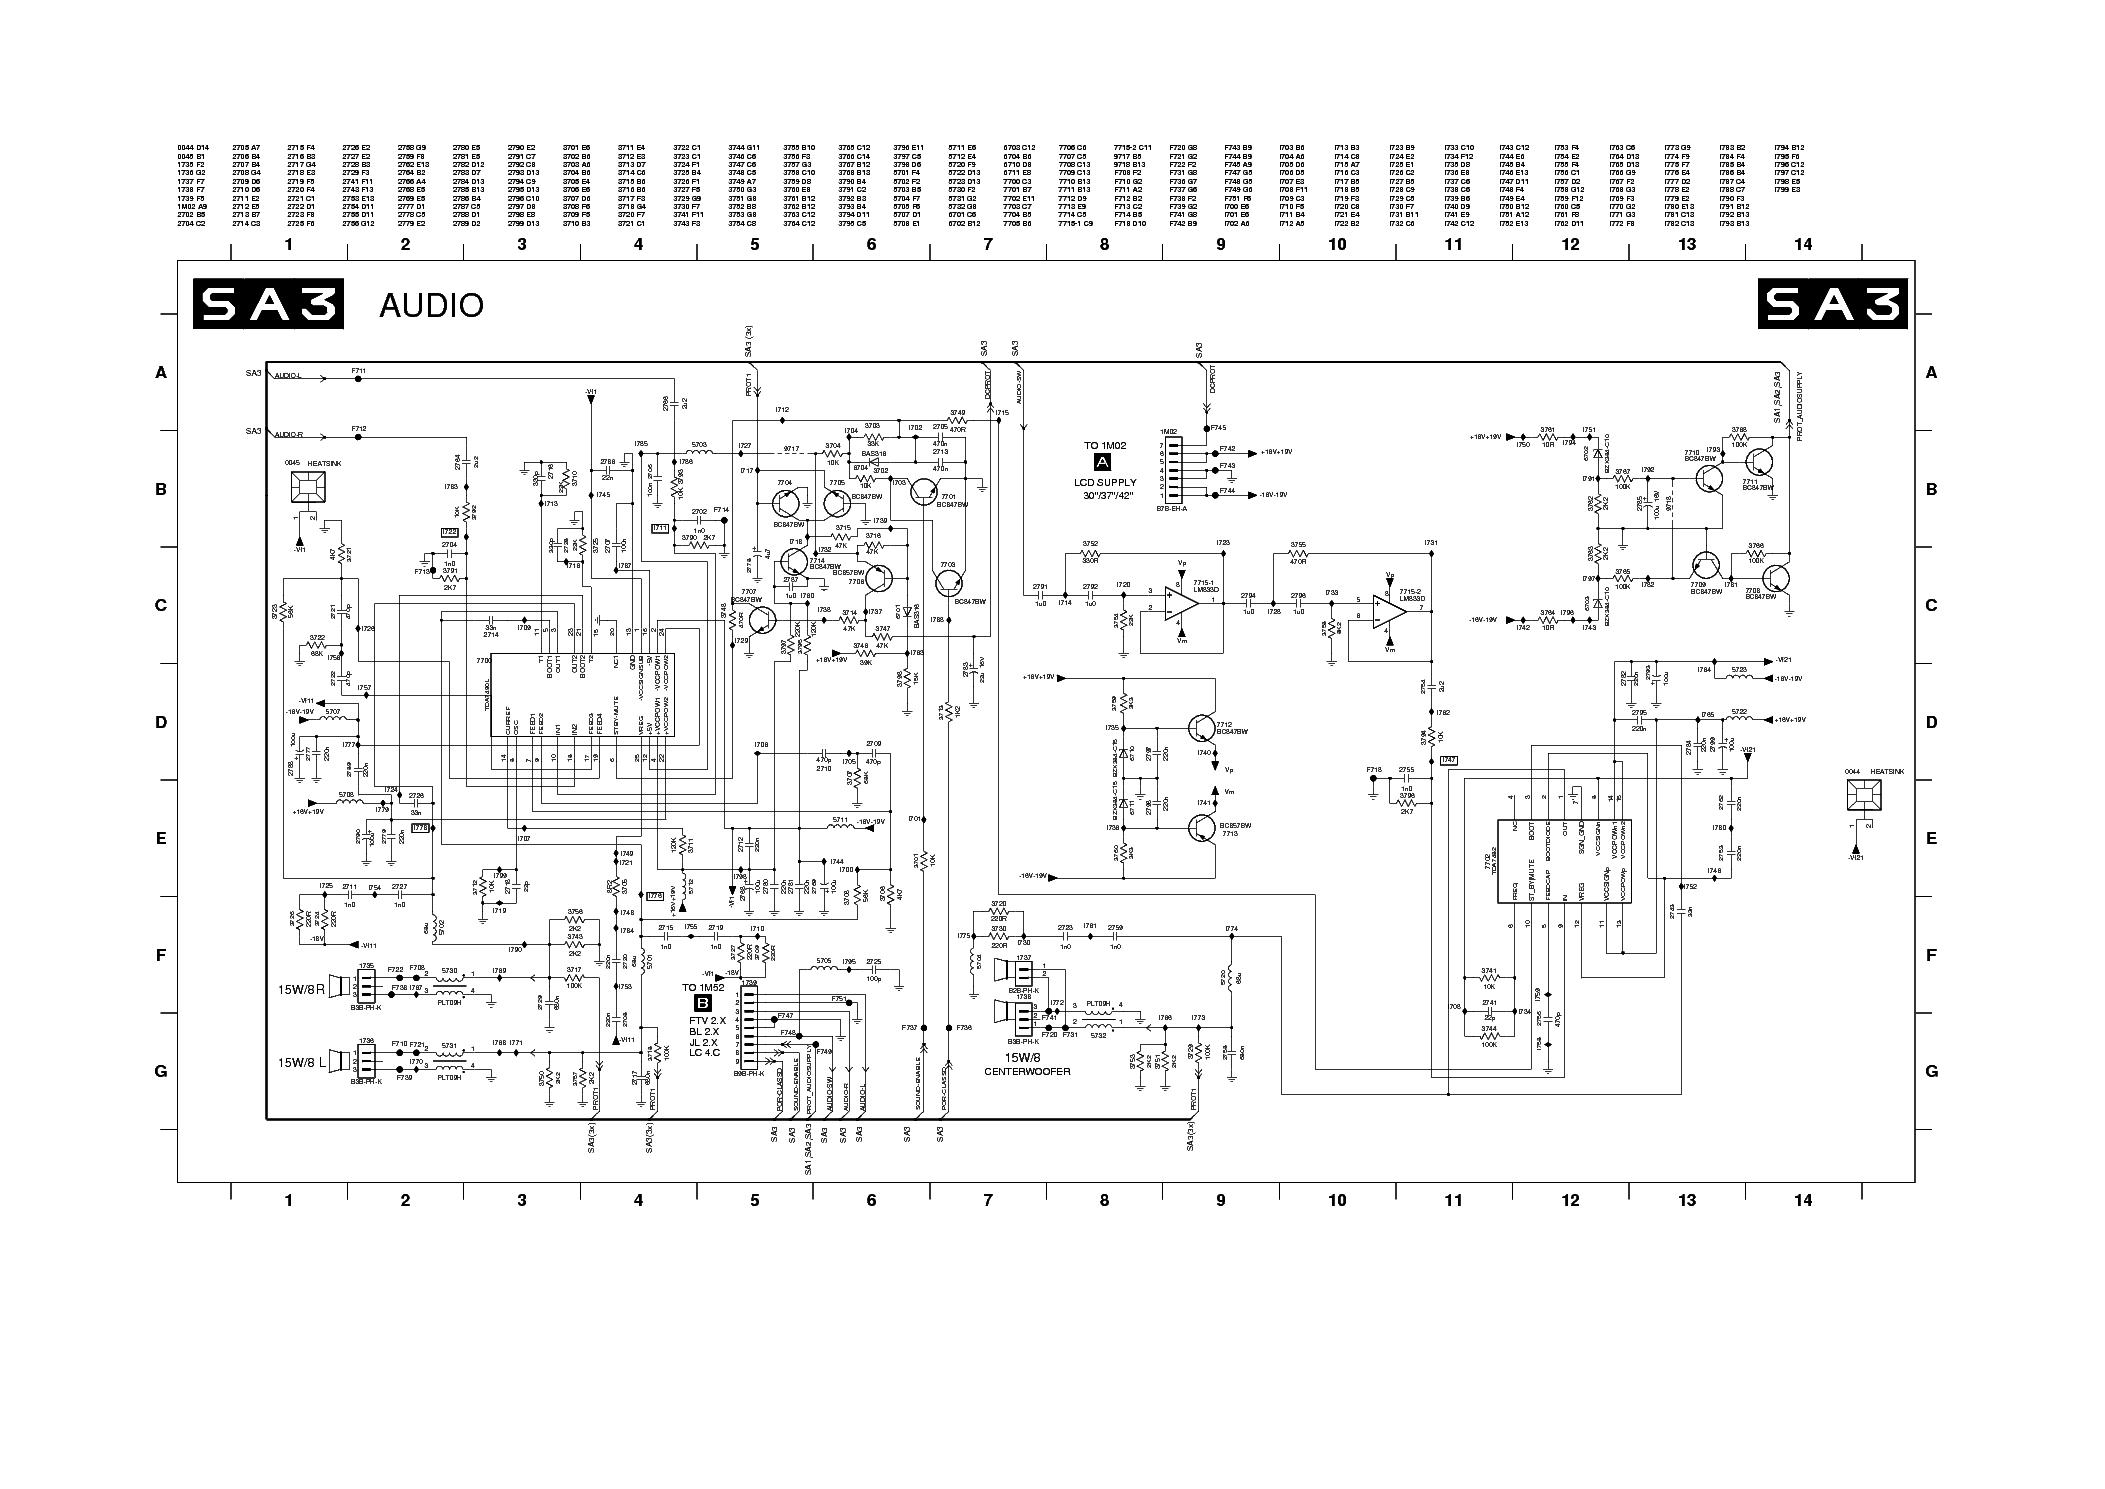 Philips 21 Tv Diagram Trusted Wiring Index 238 Control Circuit Seekiccom 42pf5421 10 Sch Service Manual Download Schematics Magnavox